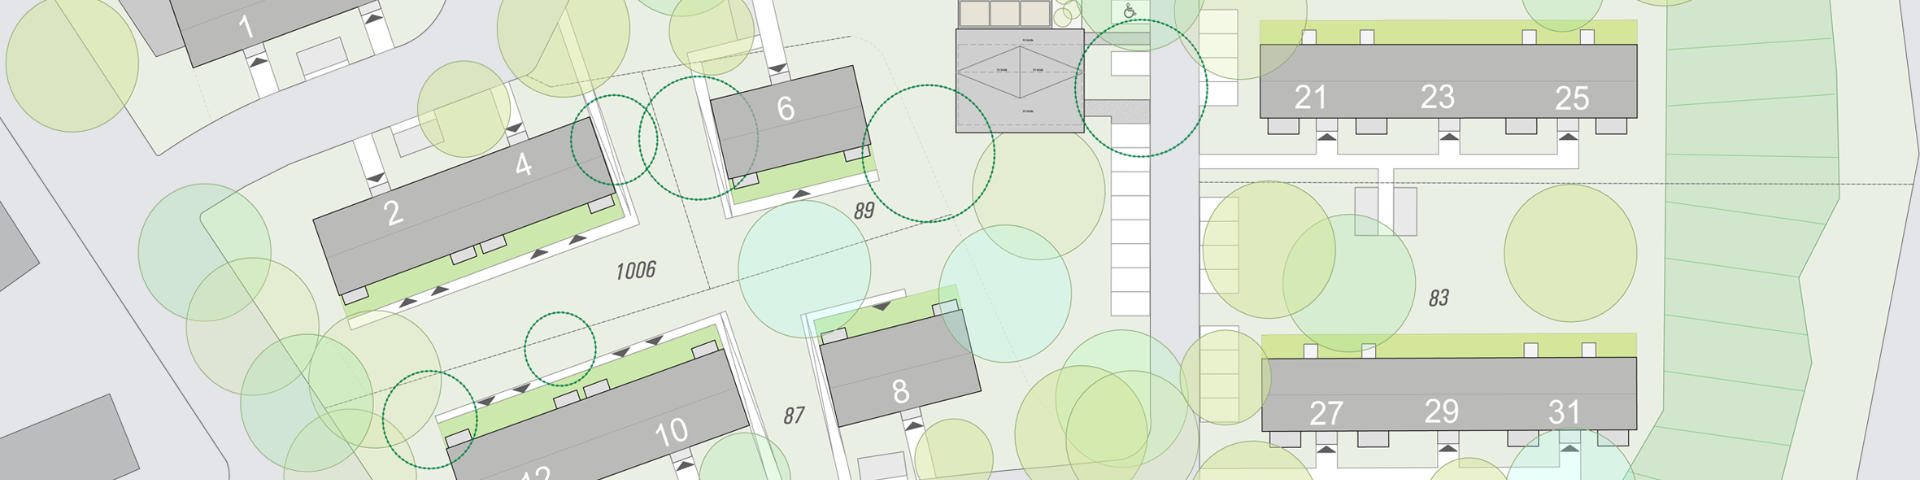 Siedlung Bochum Ausschnitt Lageplan